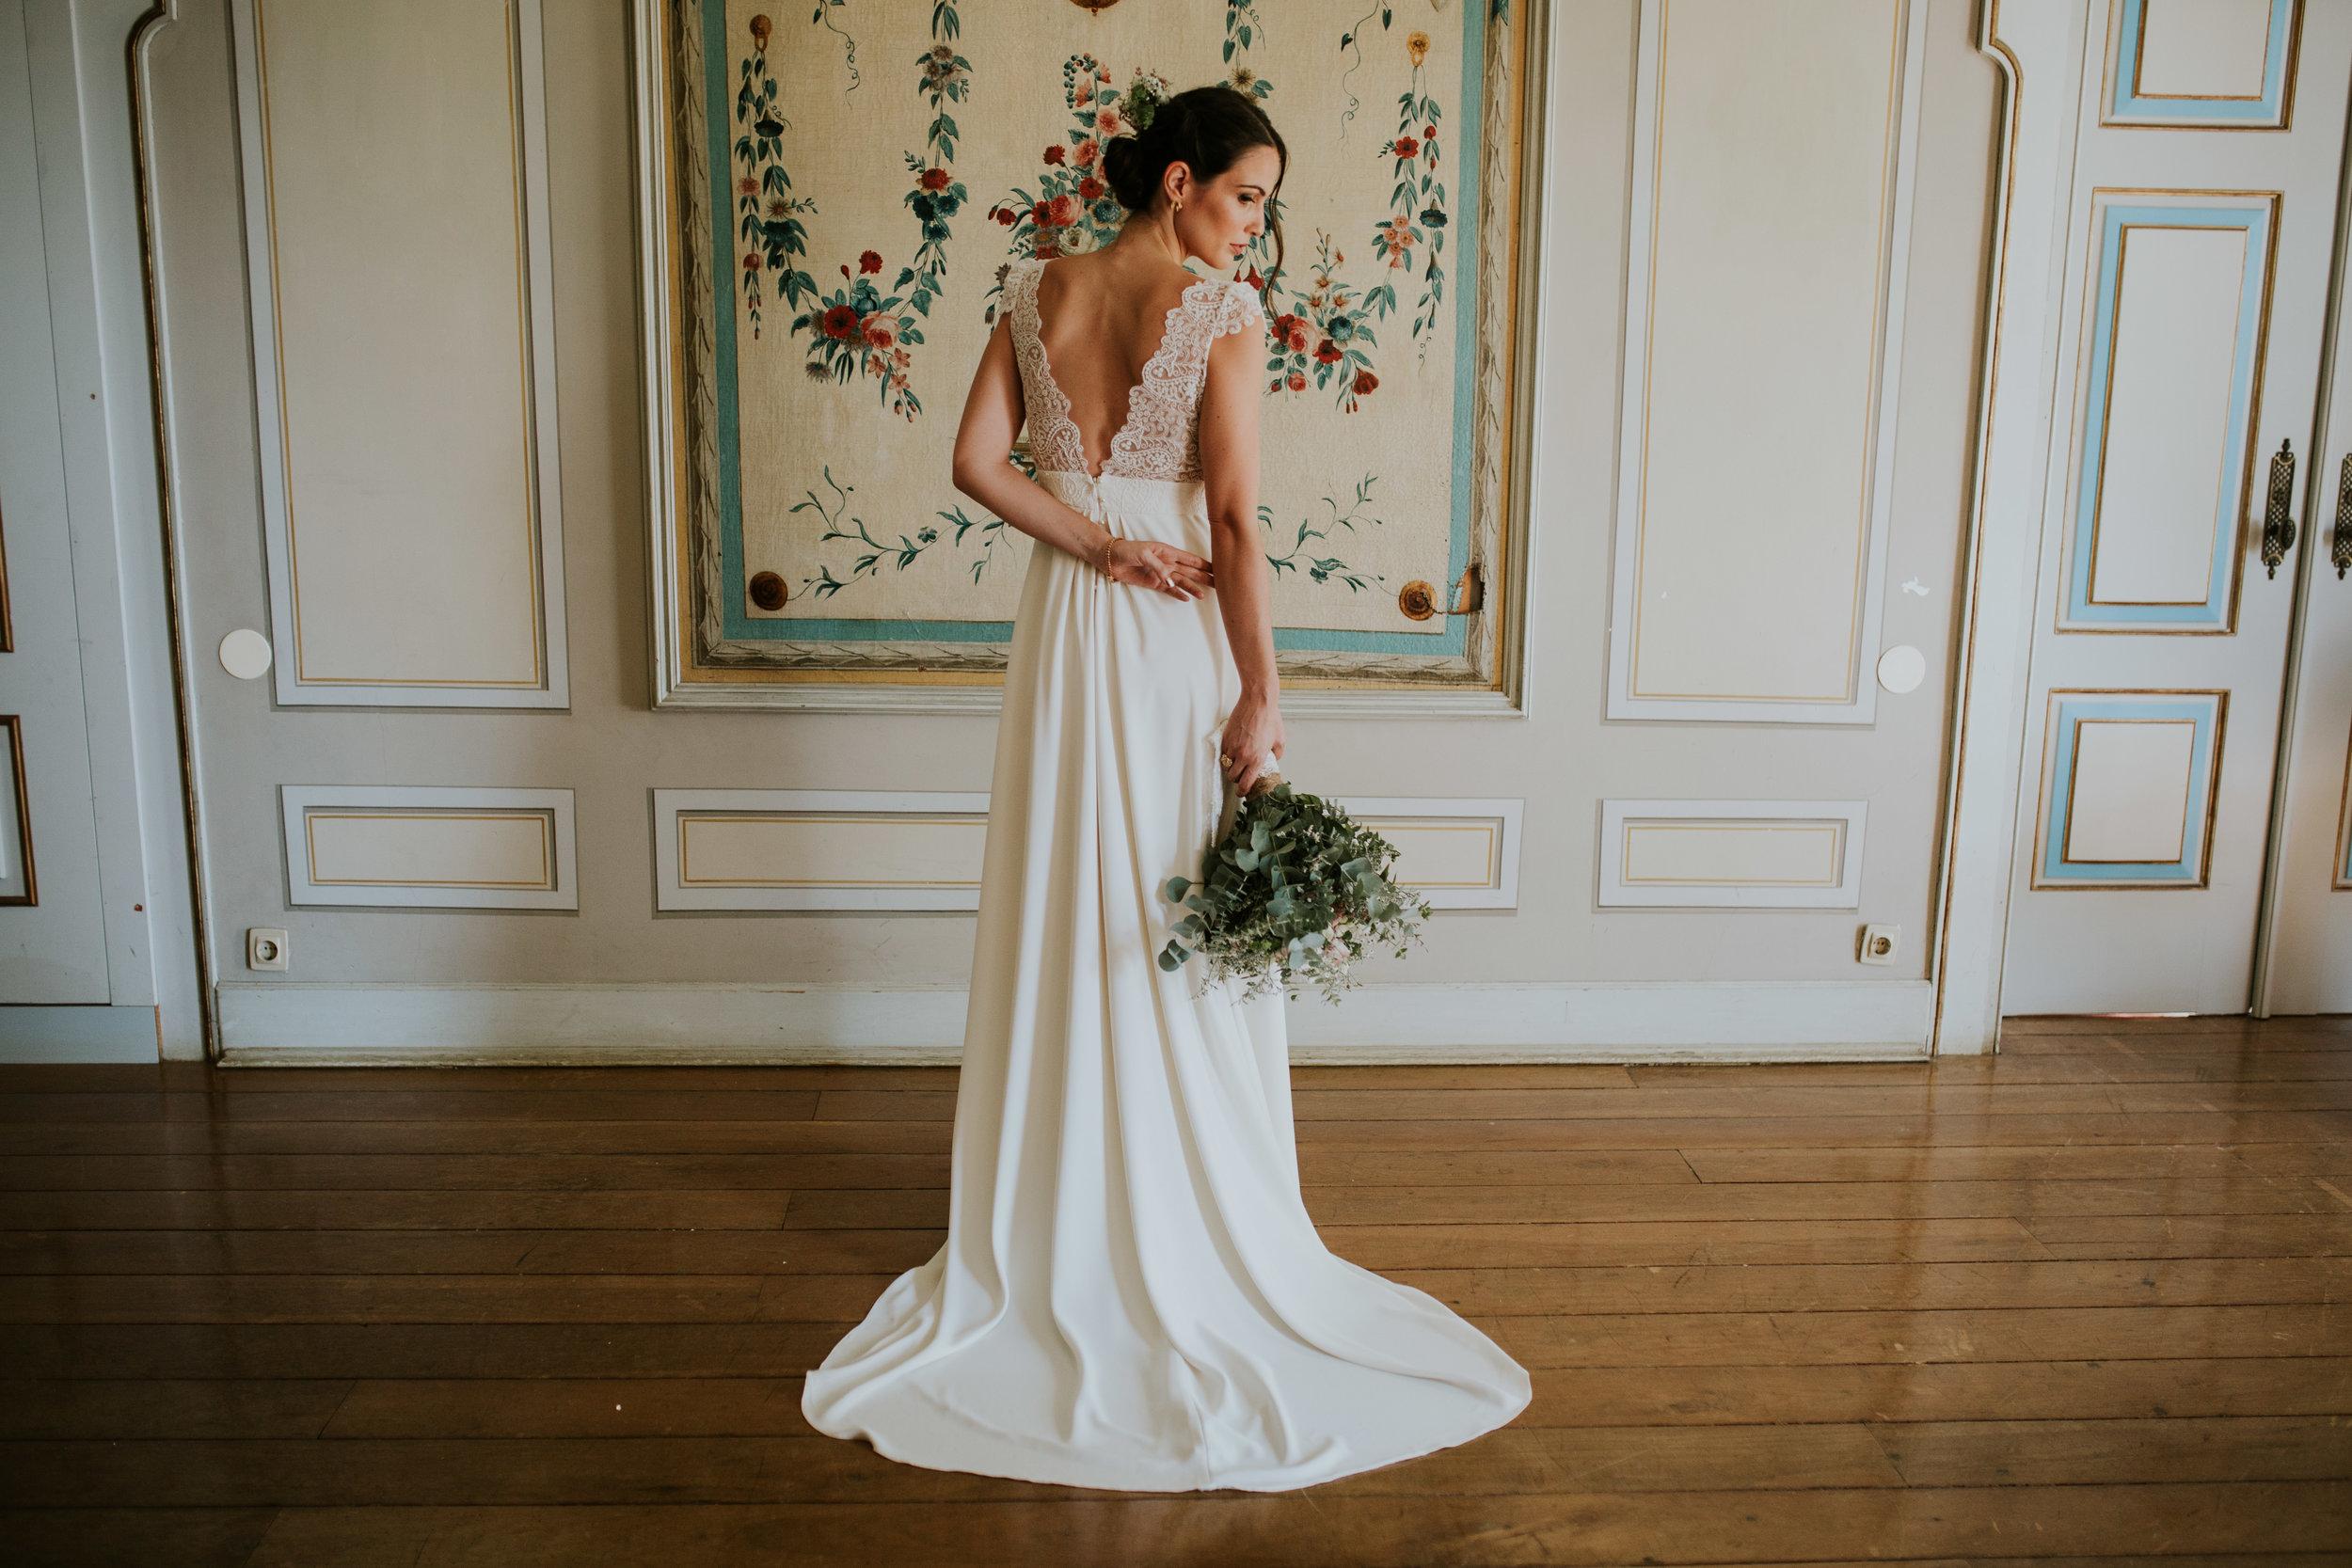 J&P 156_ 02 setembro 2017 Wedding day_.jpg